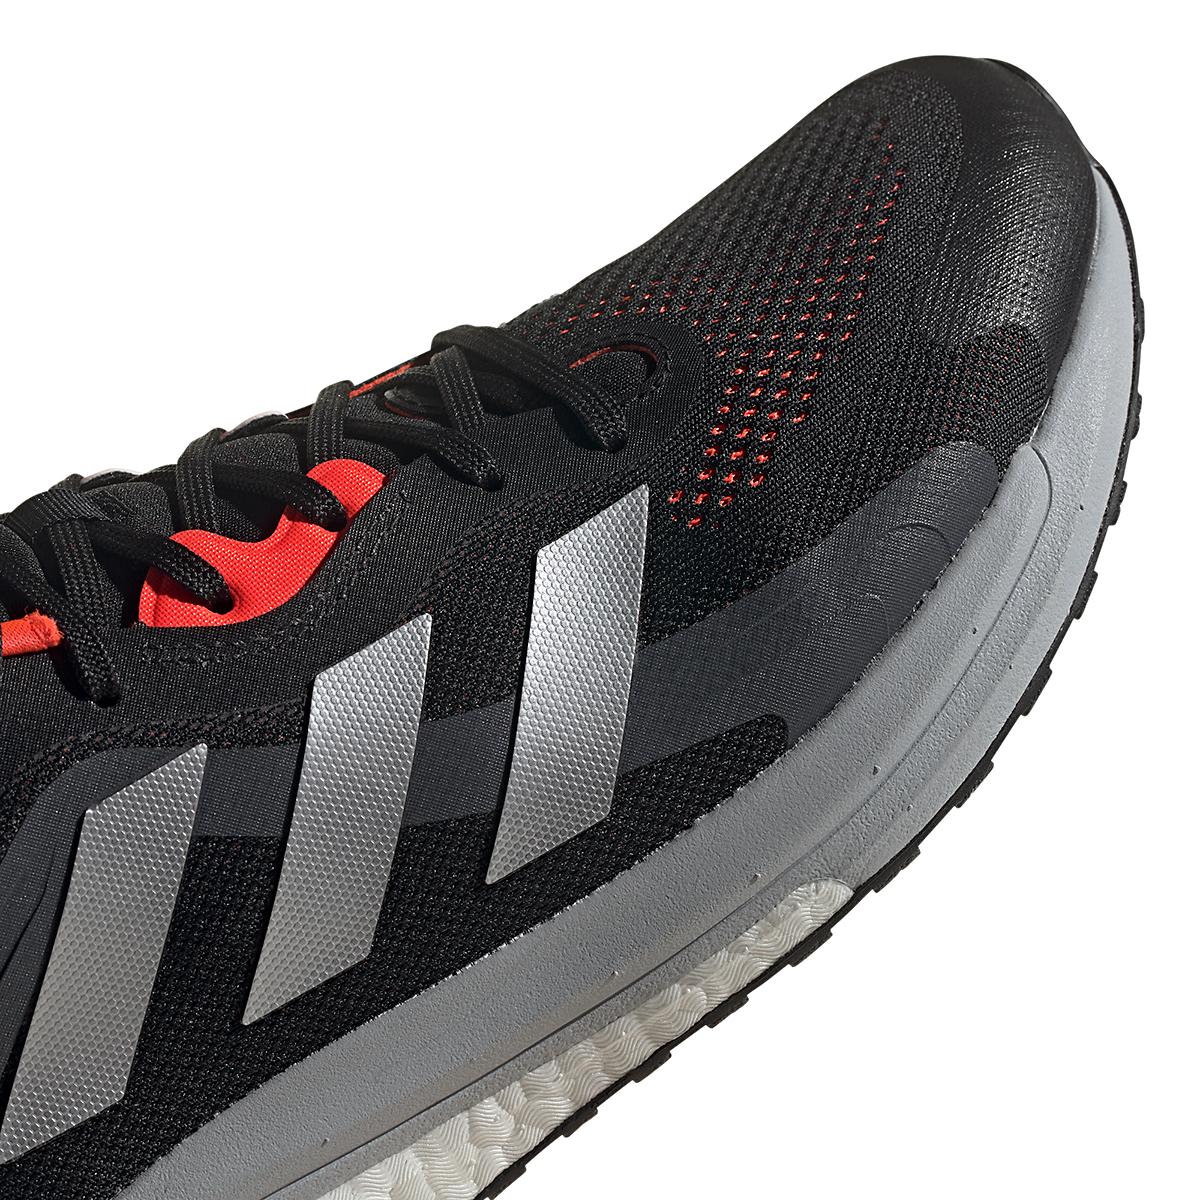 Men's Adidas Solar Glide 4 ST Running Shoe - Color: Core Black/Grey/Solar Red - Size: 6.5 - Width: Regular, Core Black/Grey/Solar Red, large, image 4